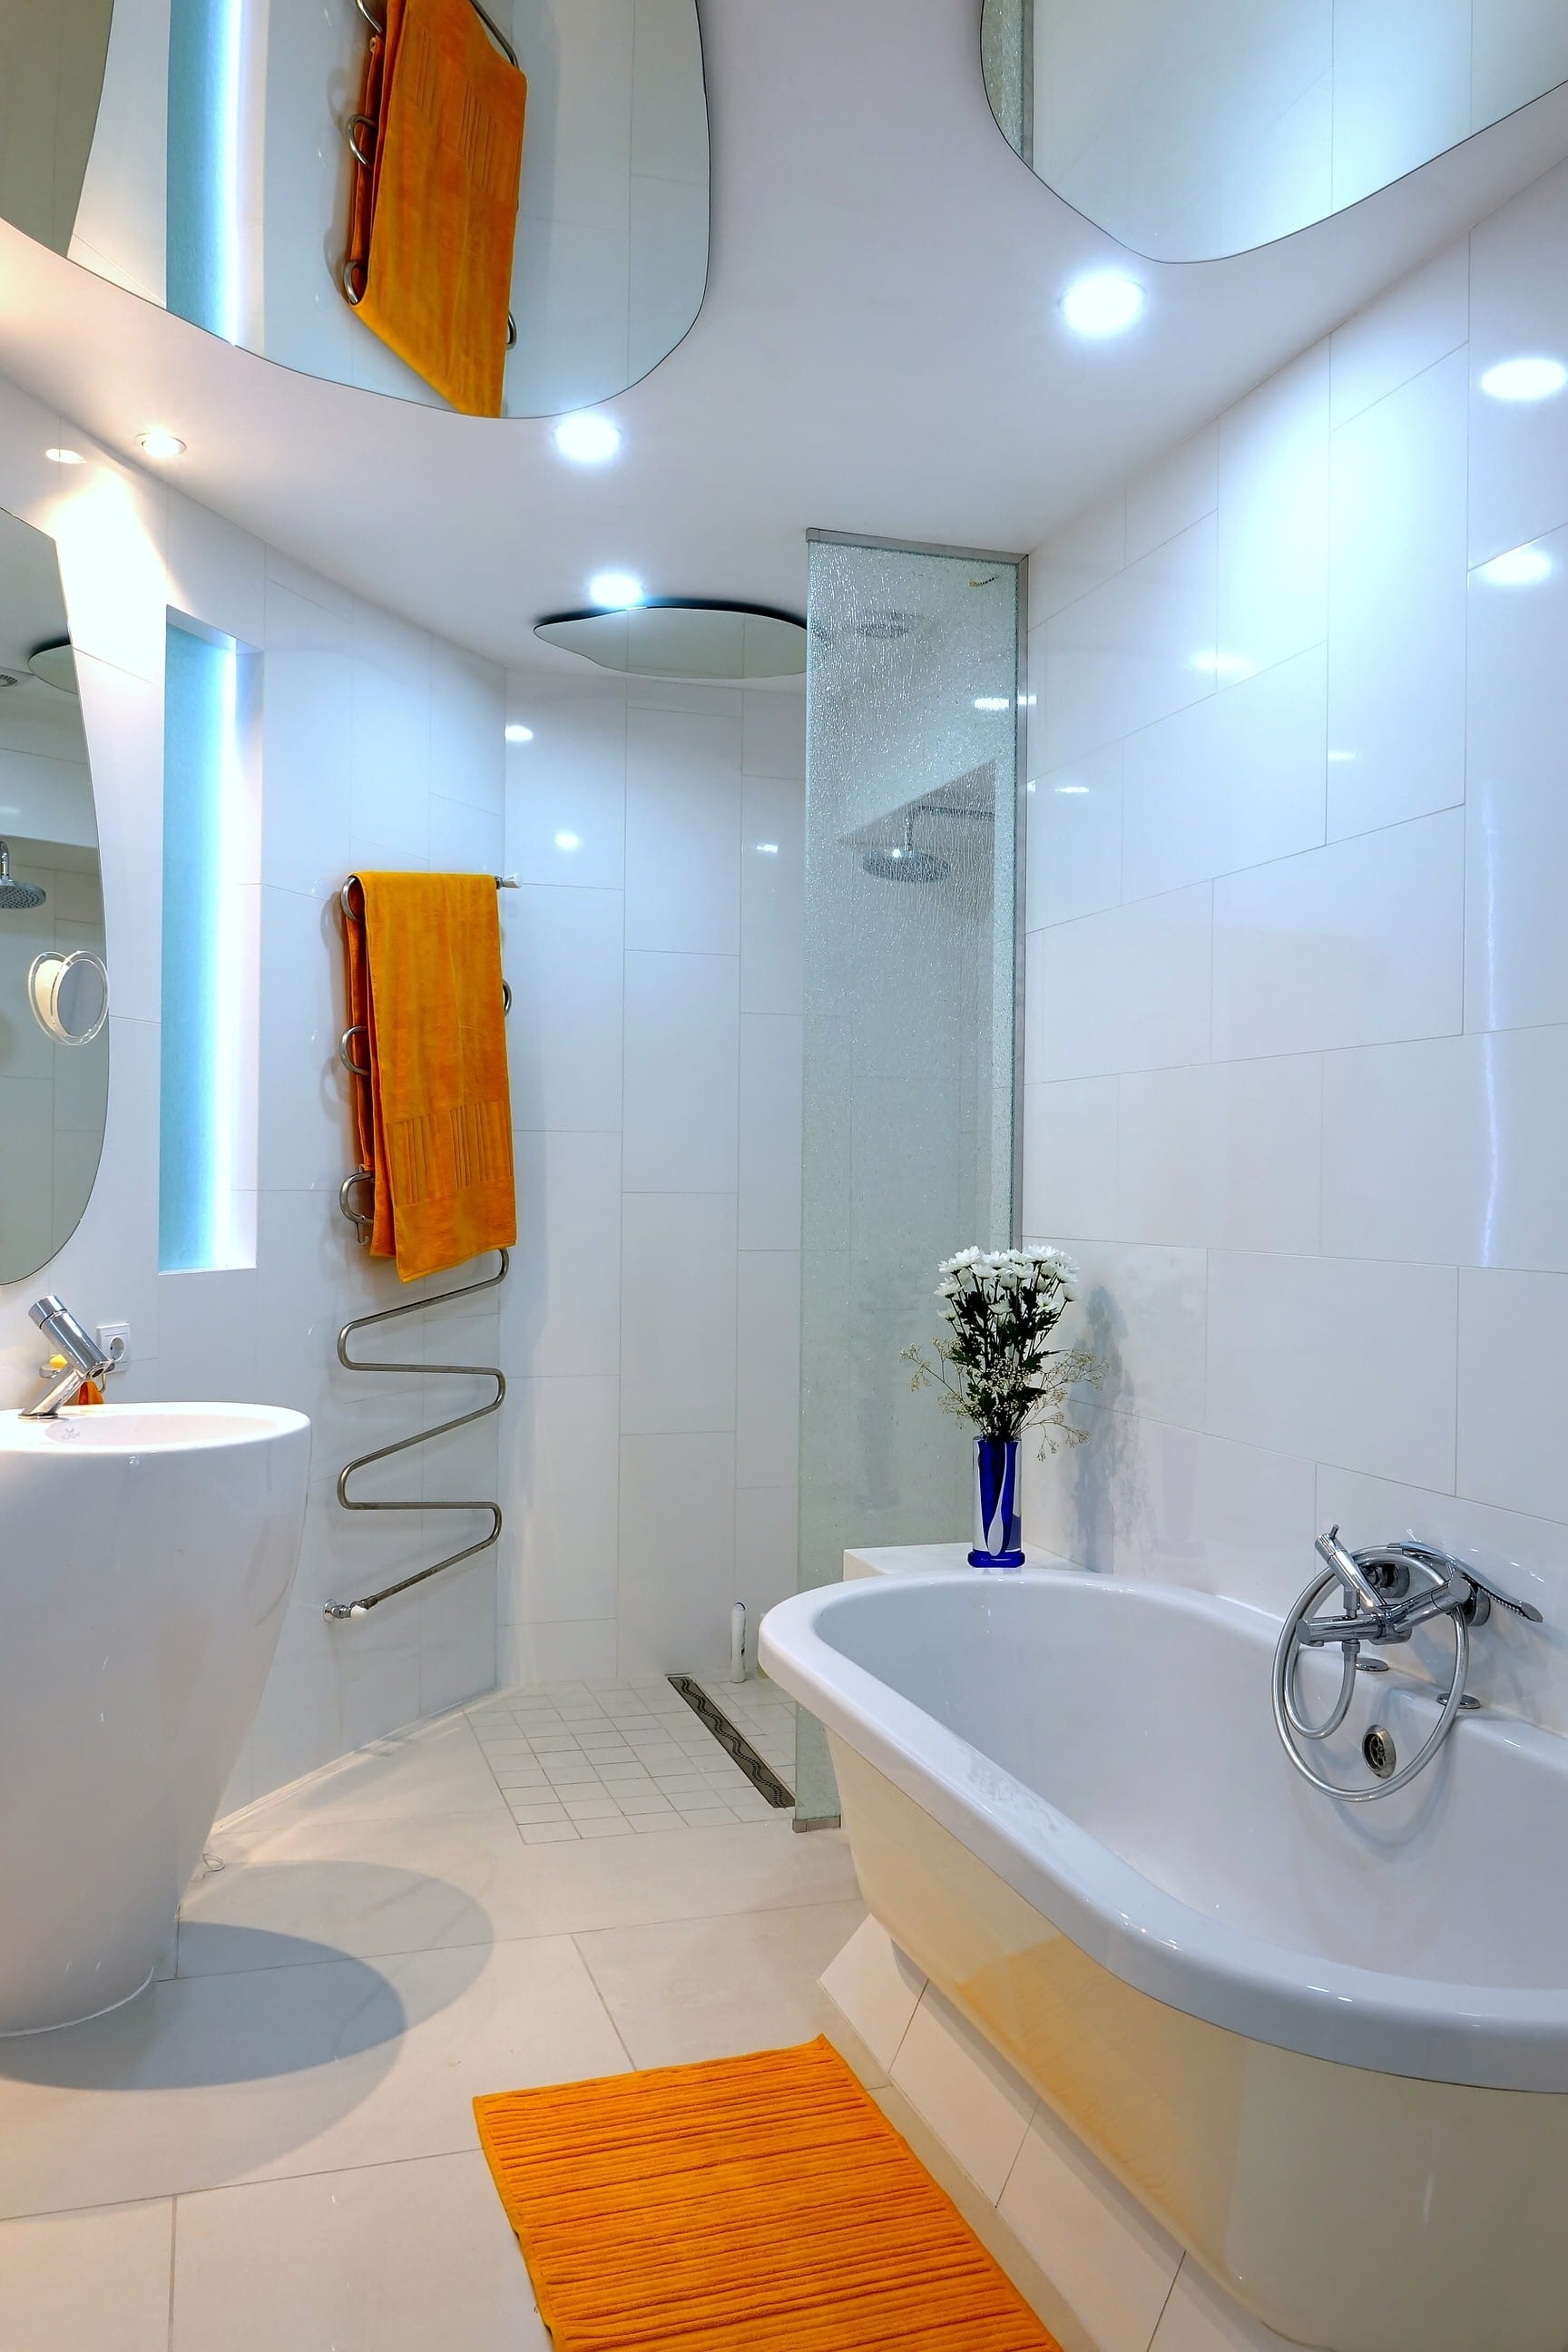 halasz-utca-modern-design-apartment-budapest-dsc00358_filtered_01